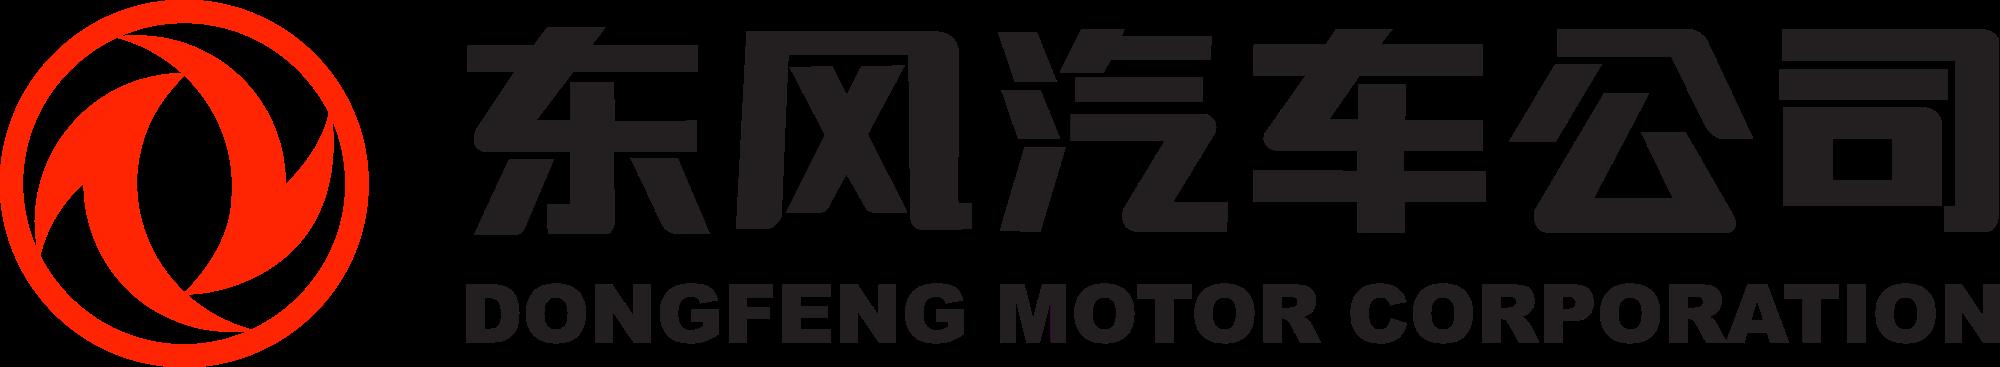 Dongfeng Motor Wuhan Open - Dongfeng Motor PNG